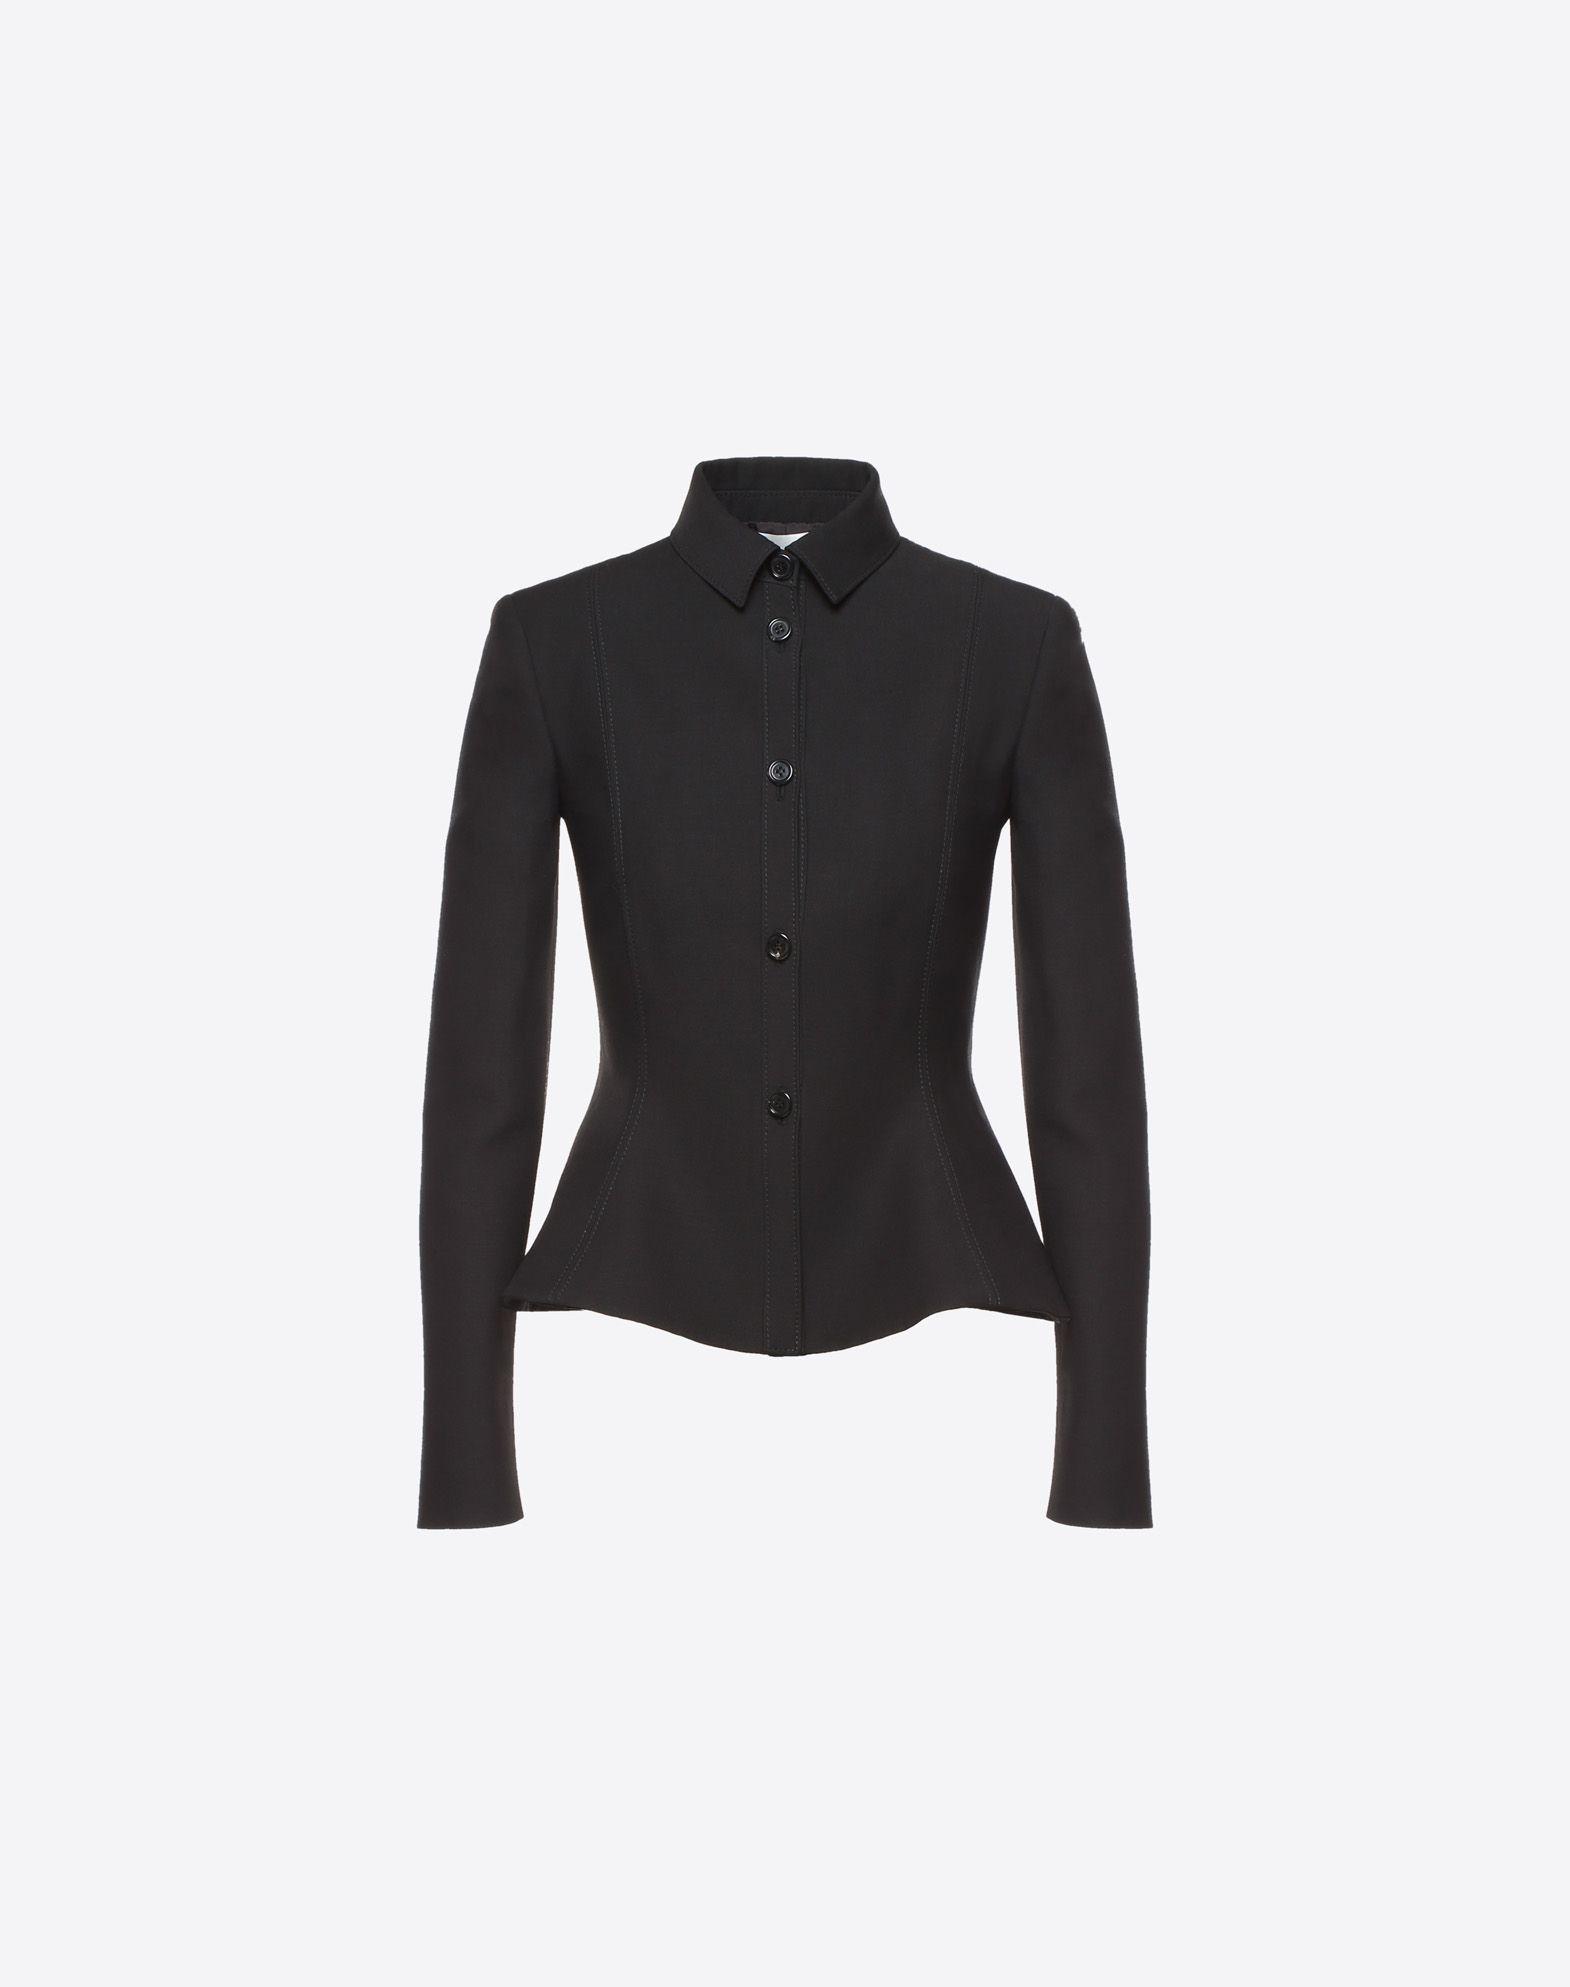 VALENTINO Couture 绉绸夹克 夹克 D f